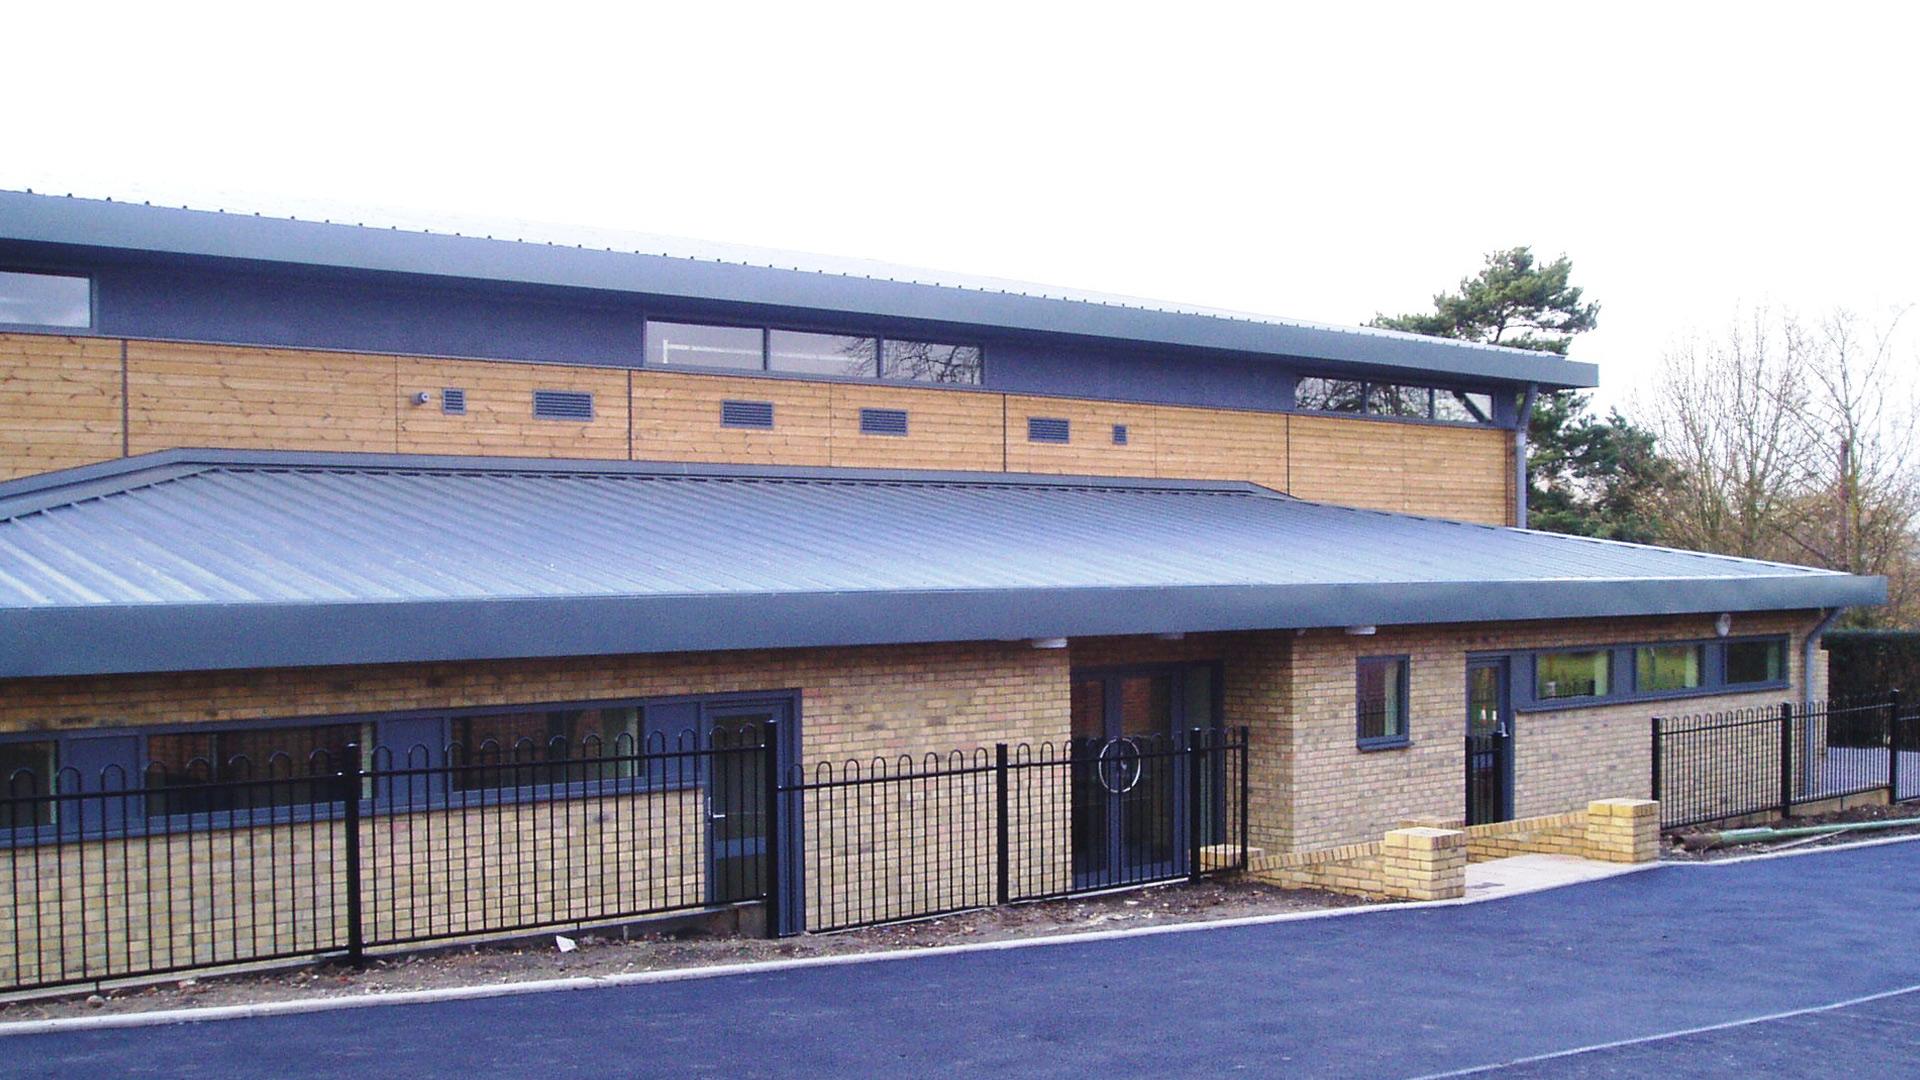 cs-littlegarth-school-1